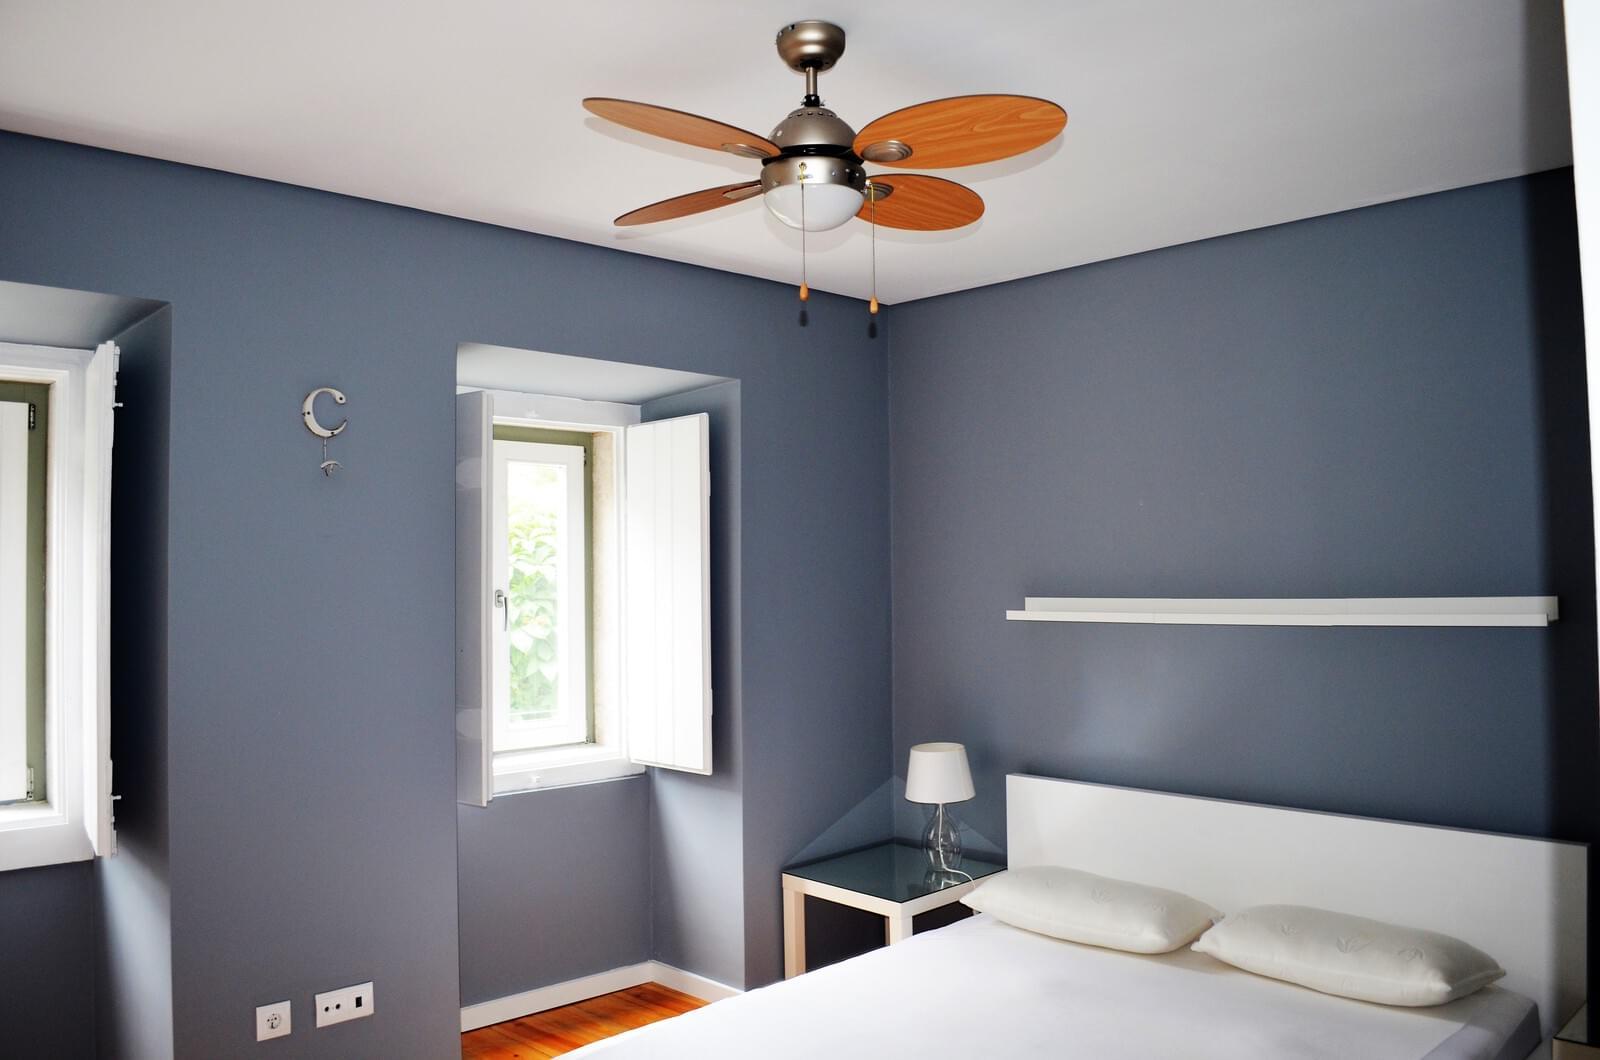 pf17785-apartamento-t1-lisboa-04c5951a-f673-49c1-882c-591cc4e02ad5